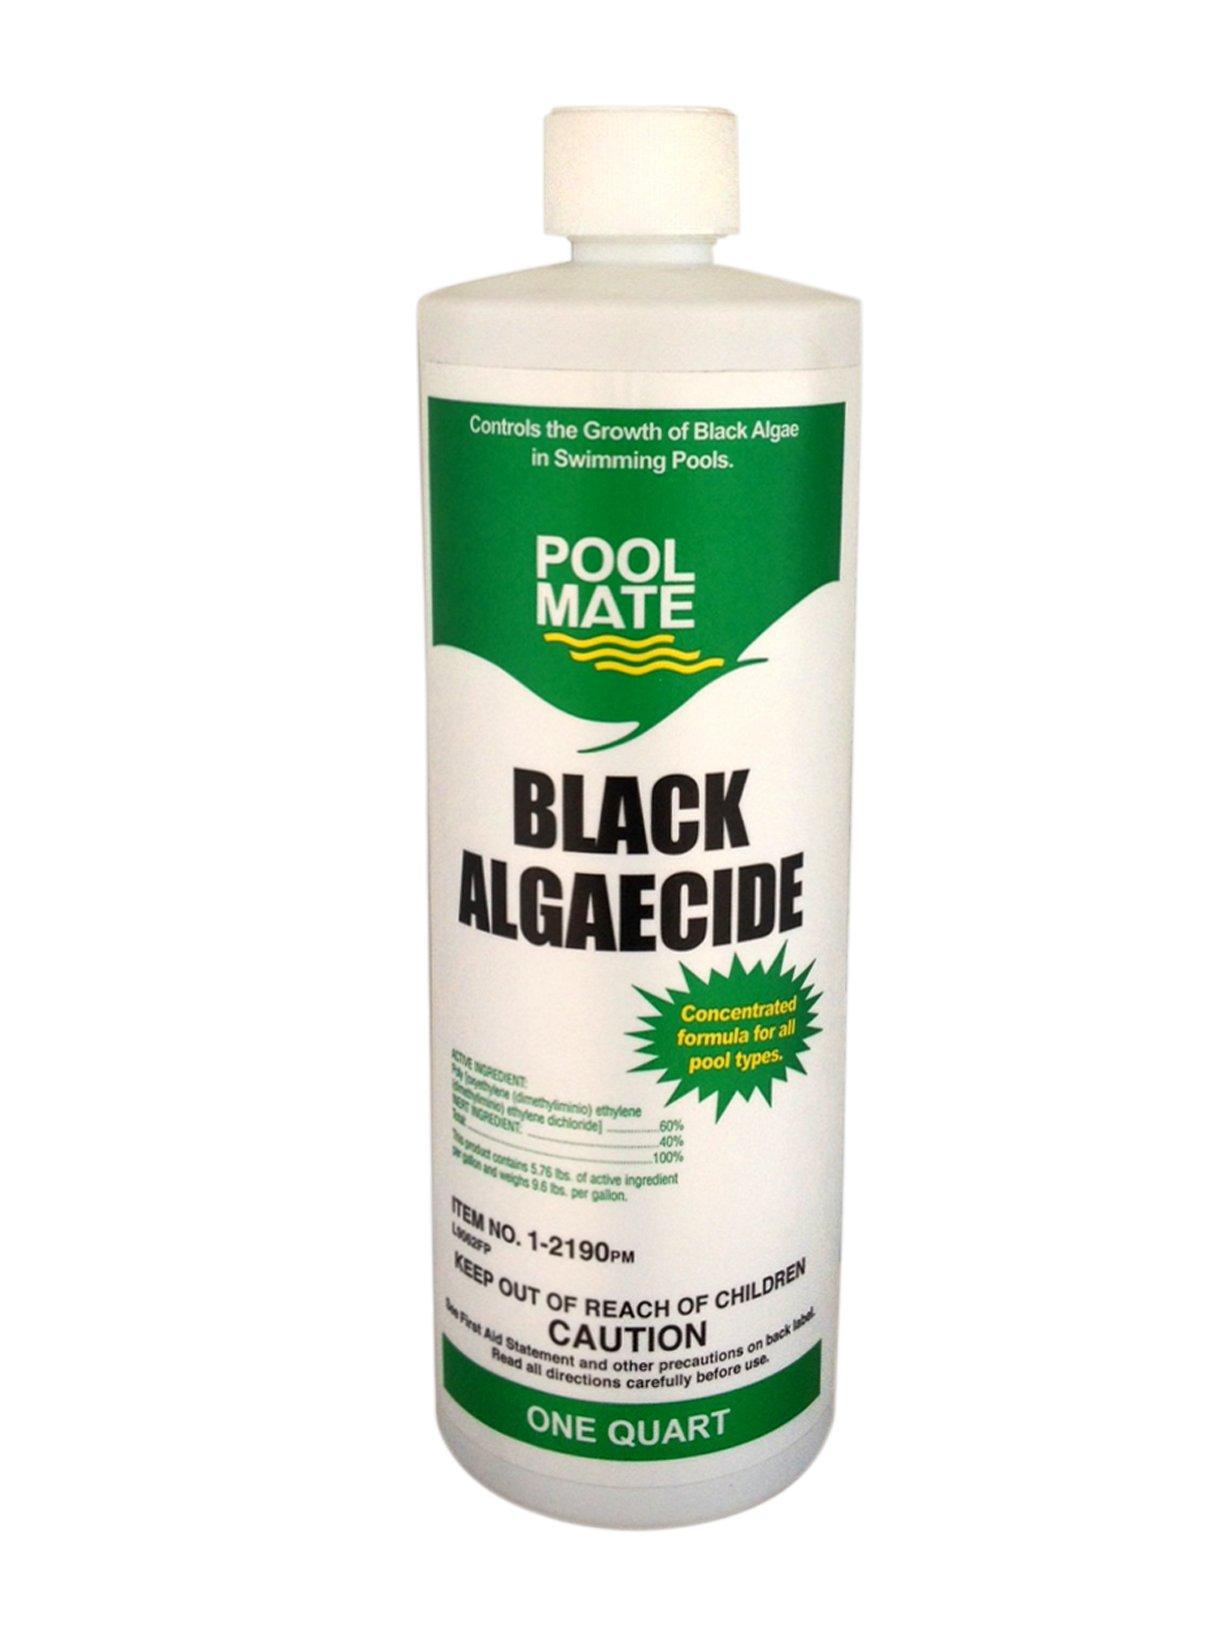 Pool Mate 1-2190 Black Algaecide for Swimming Pools, 1-Quart by Pool Mate